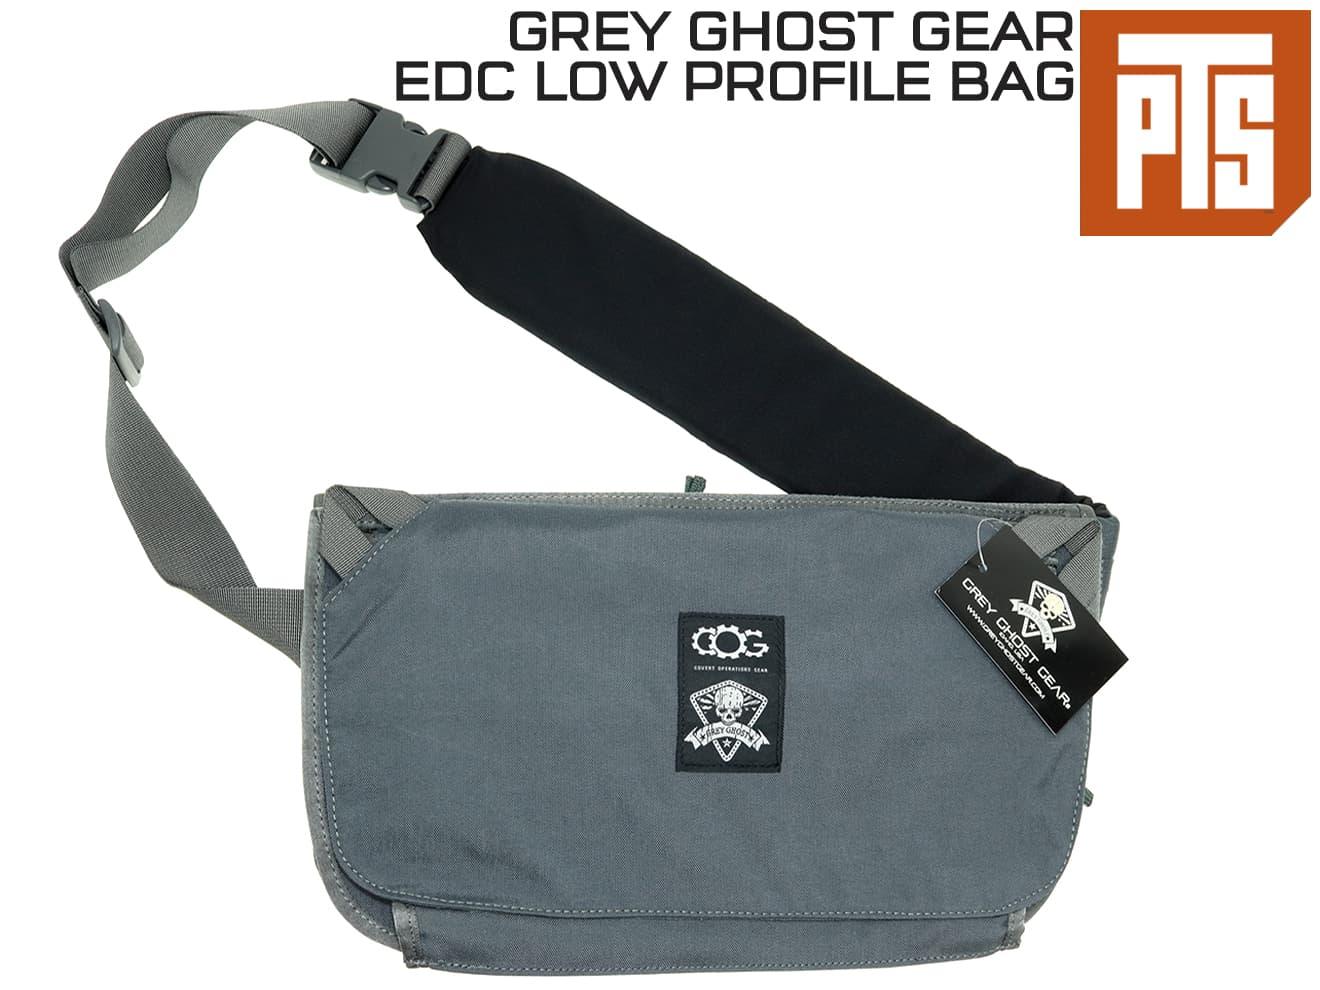 PTS Grey Ghost Gear COG EDCロープロファイルバッグ◆WG グレイゴーストギア 多目的バッグ ユニバーサル 変形可能 ガンケースに M9G17など